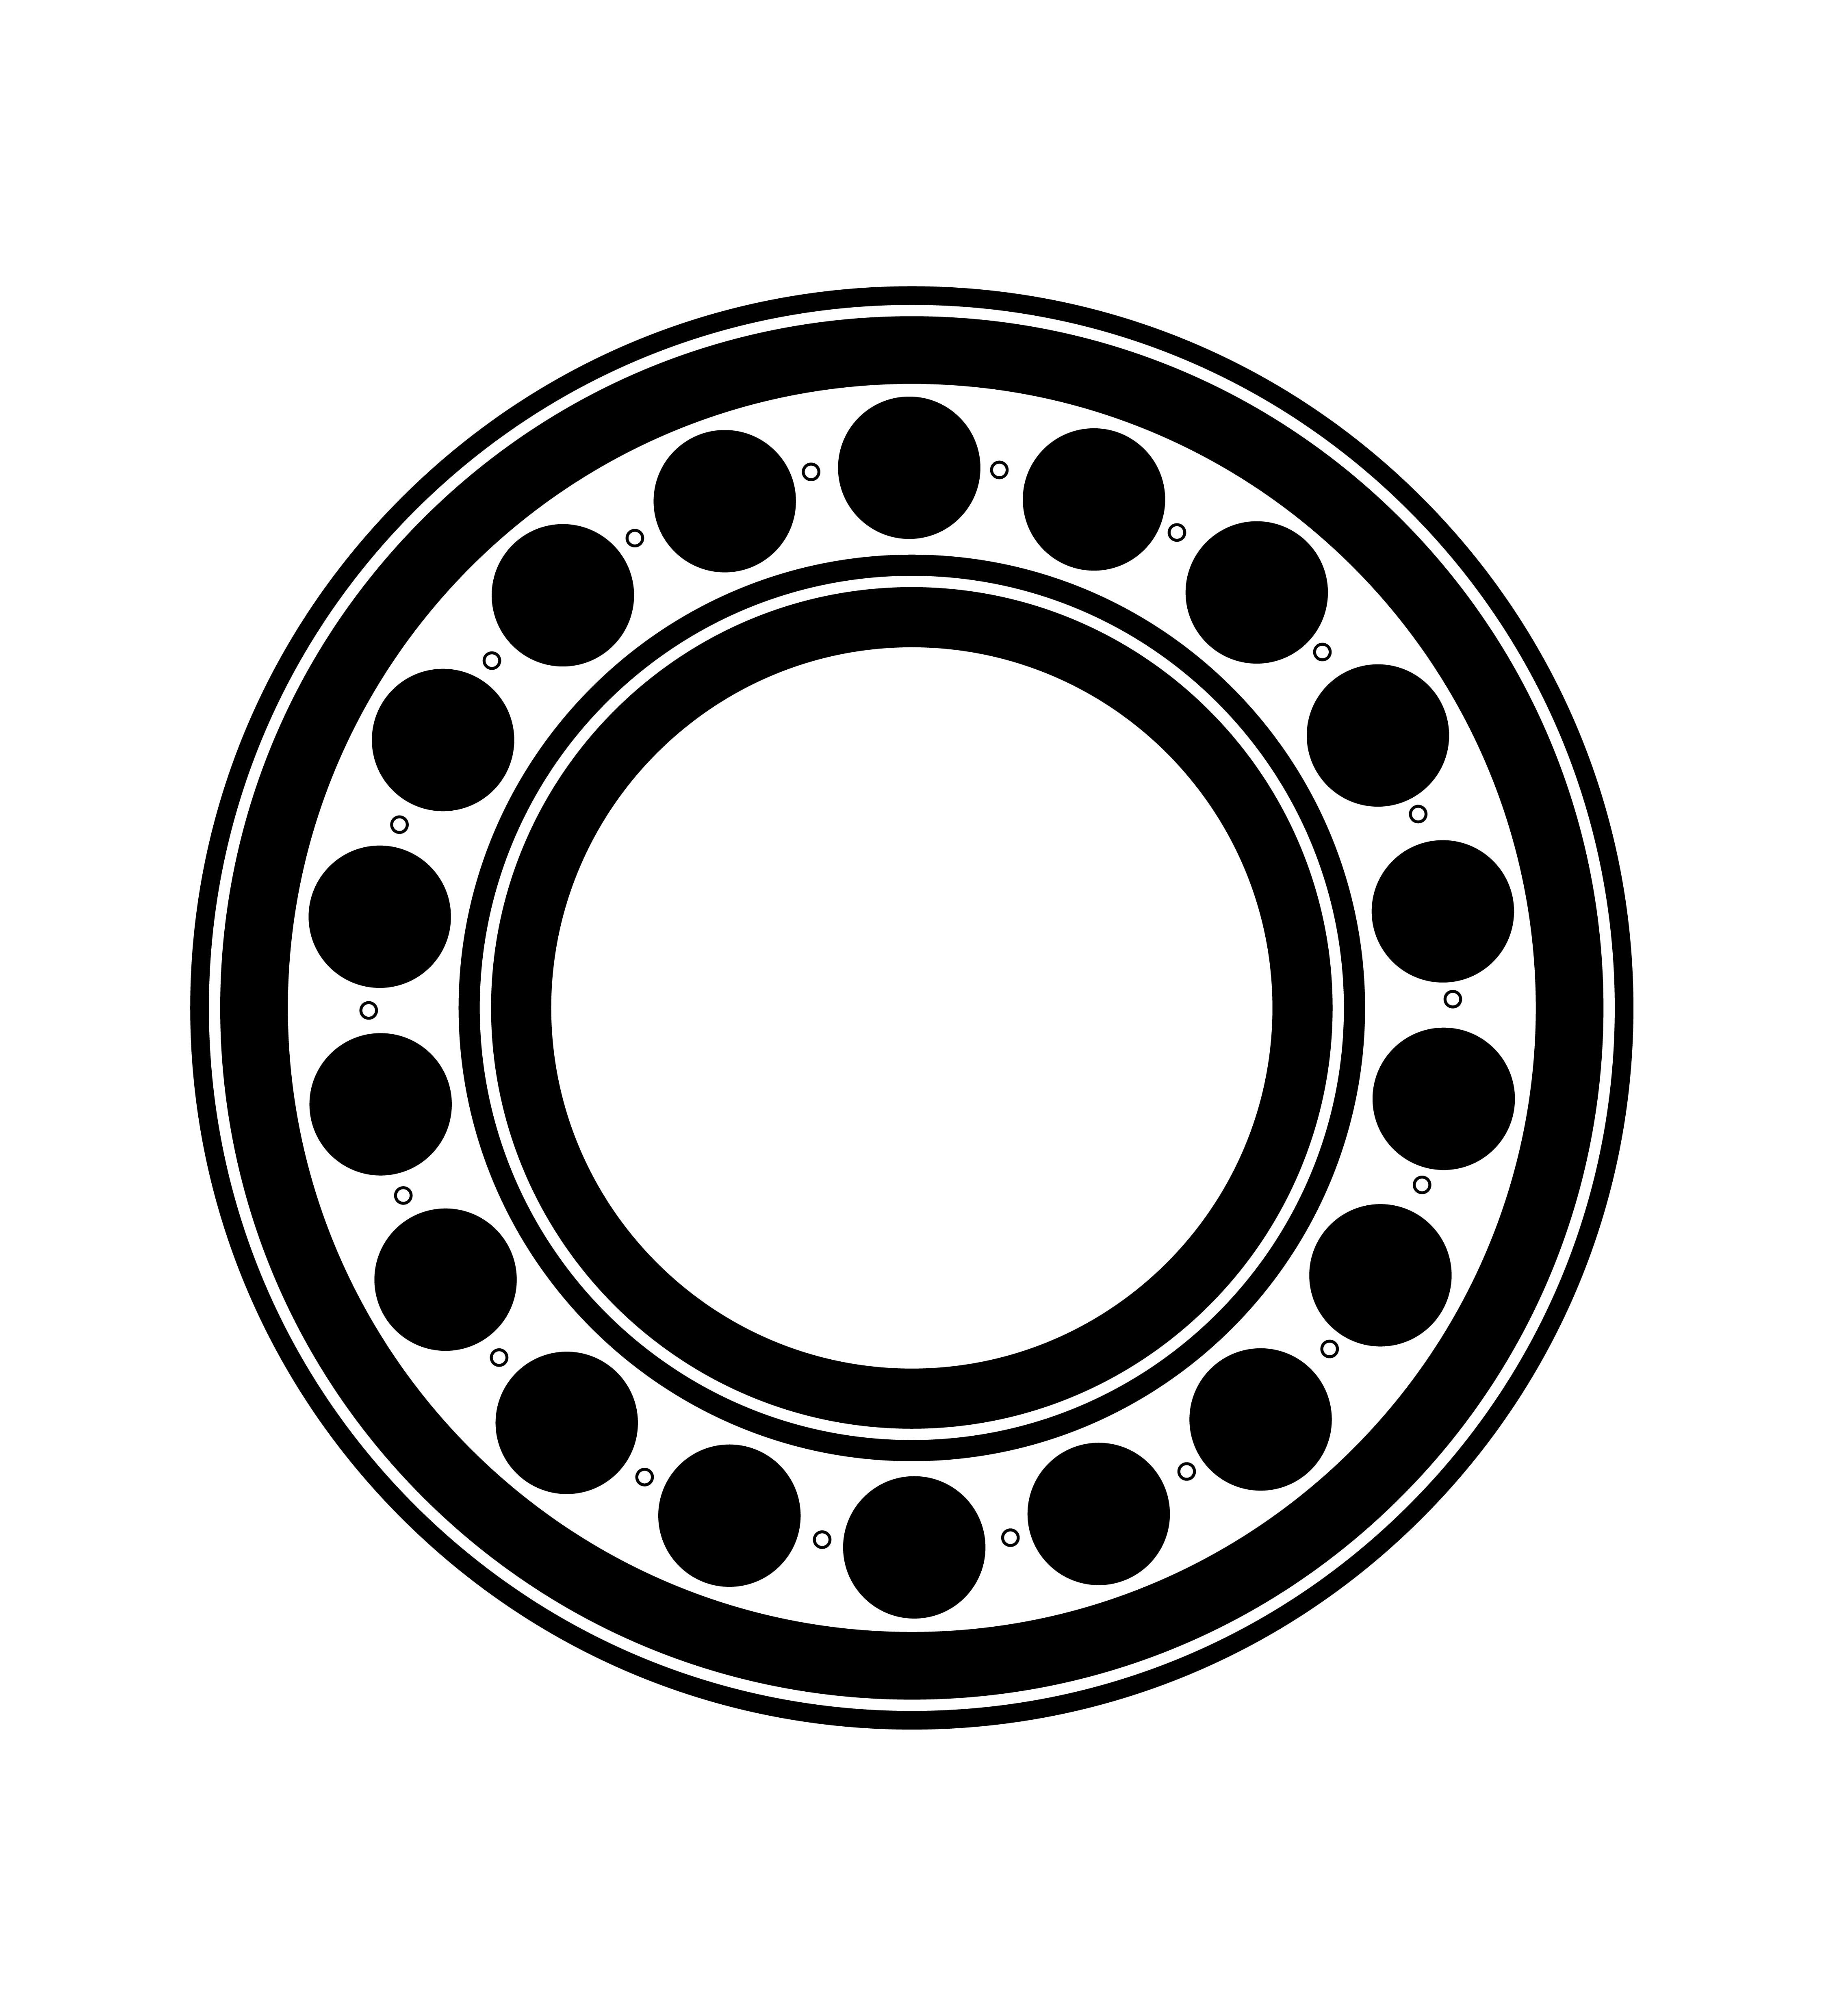 Metal Ball Bearing Black Silhouette Outline Vector